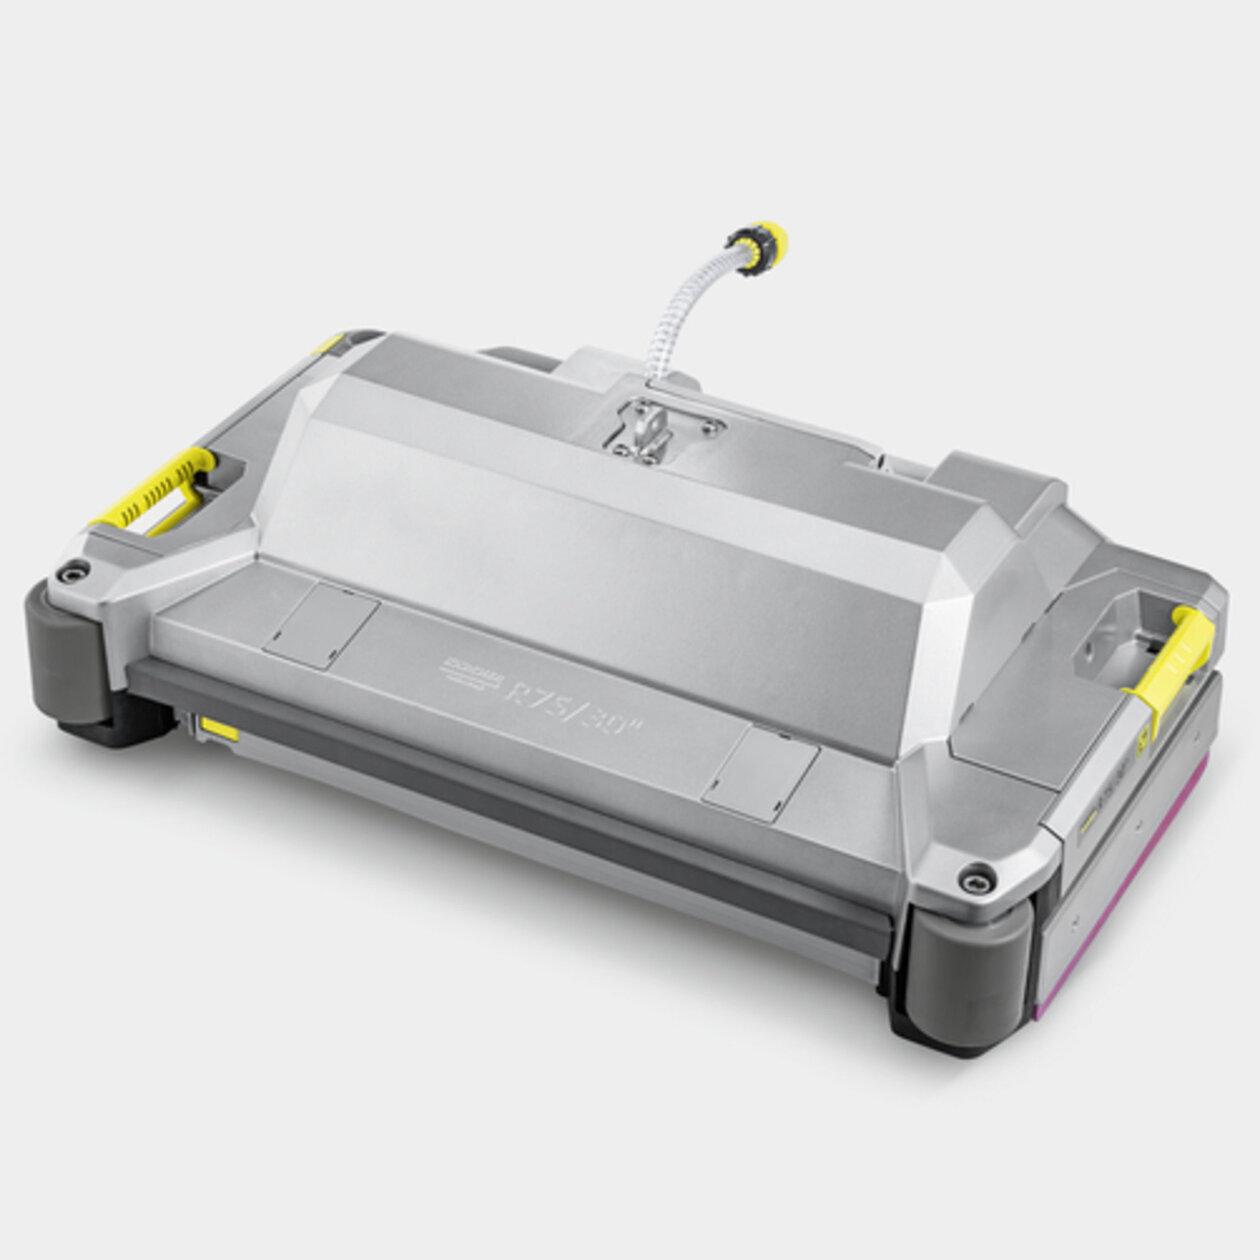 Schrob-/zuigmachine B 110 R Bp Pack 170Ah+Dose+SSD+FleetEU+R75: Walsborstelkop met geïntegreerde veegunit